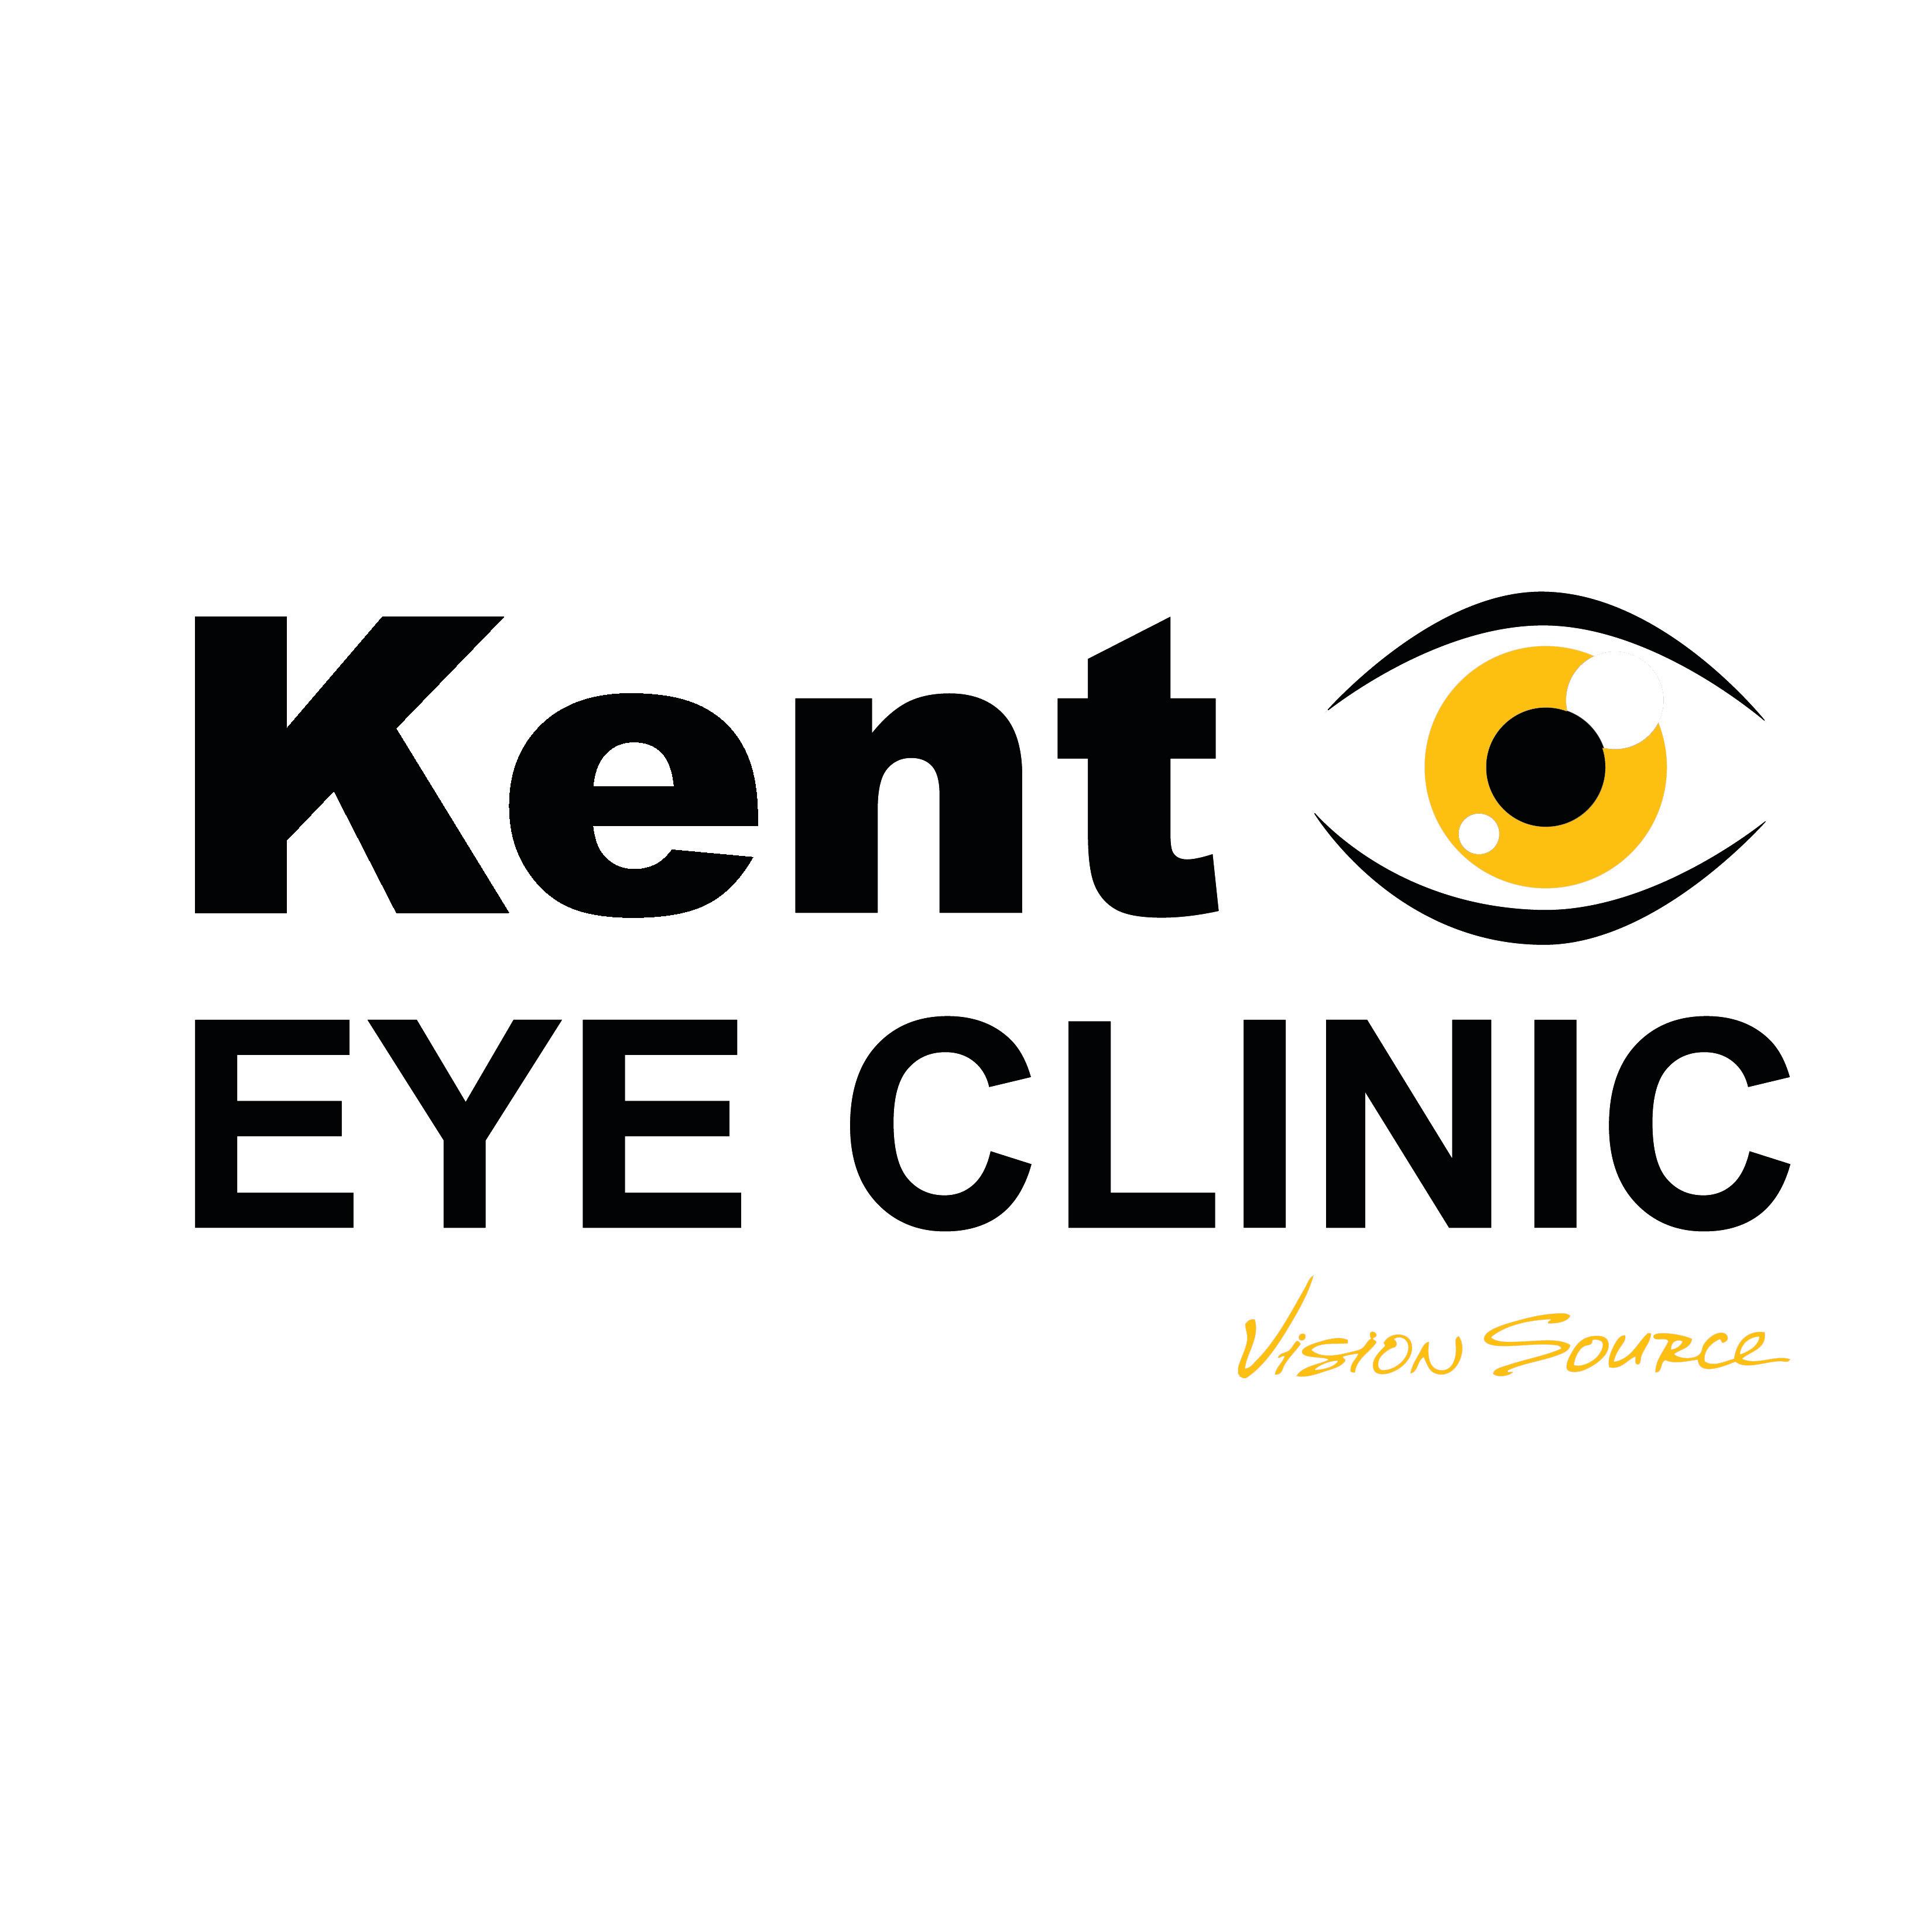 Kent Eye Clinic image 3